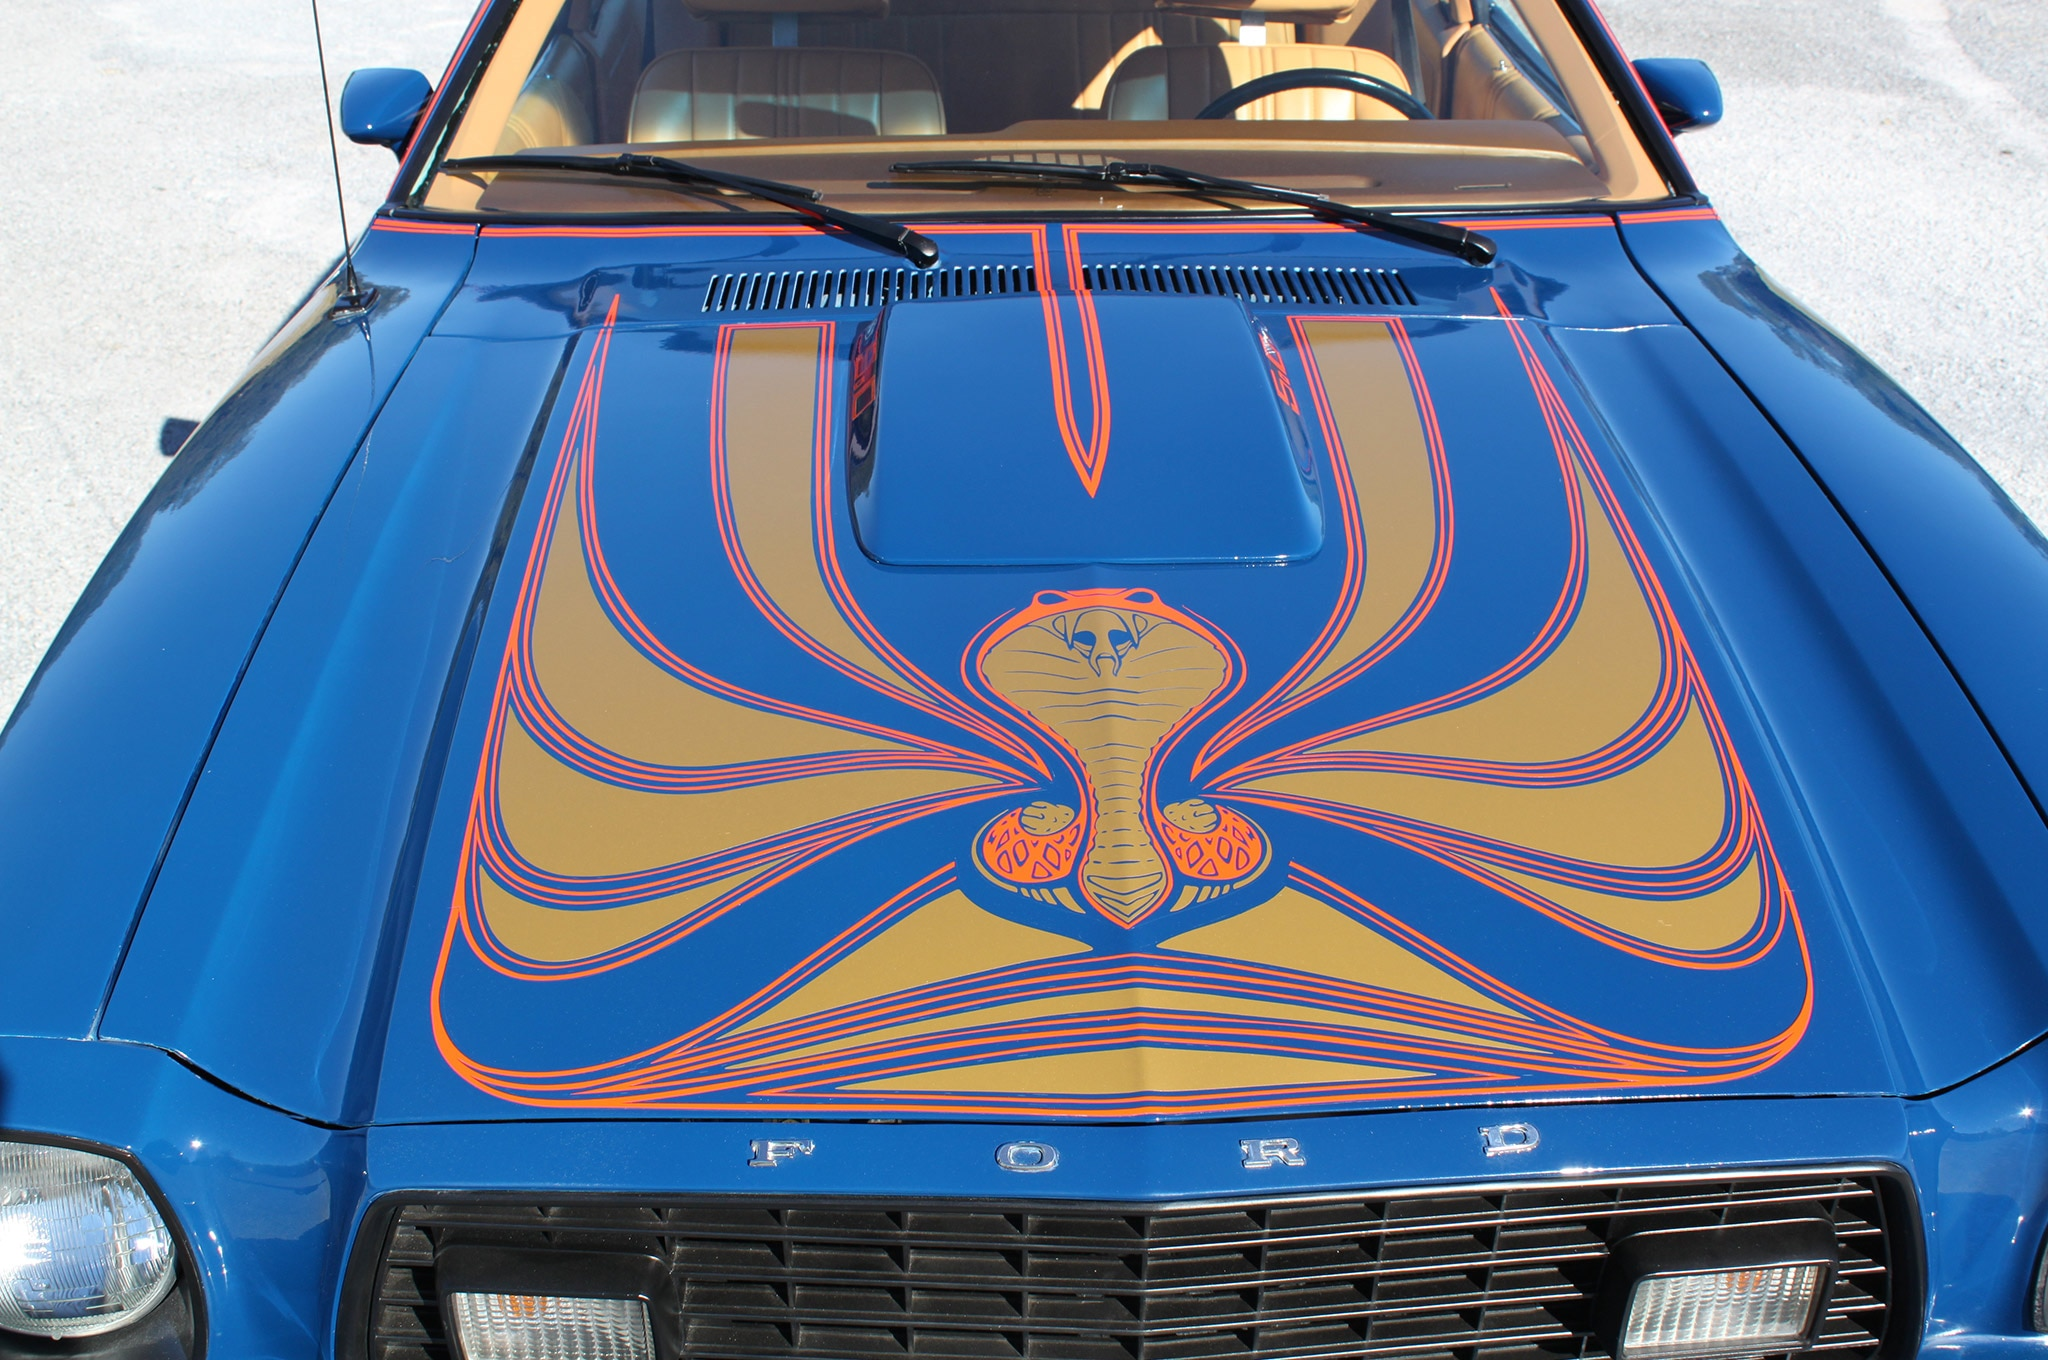 Bobby Aldrich 1978 Mustang II Hood